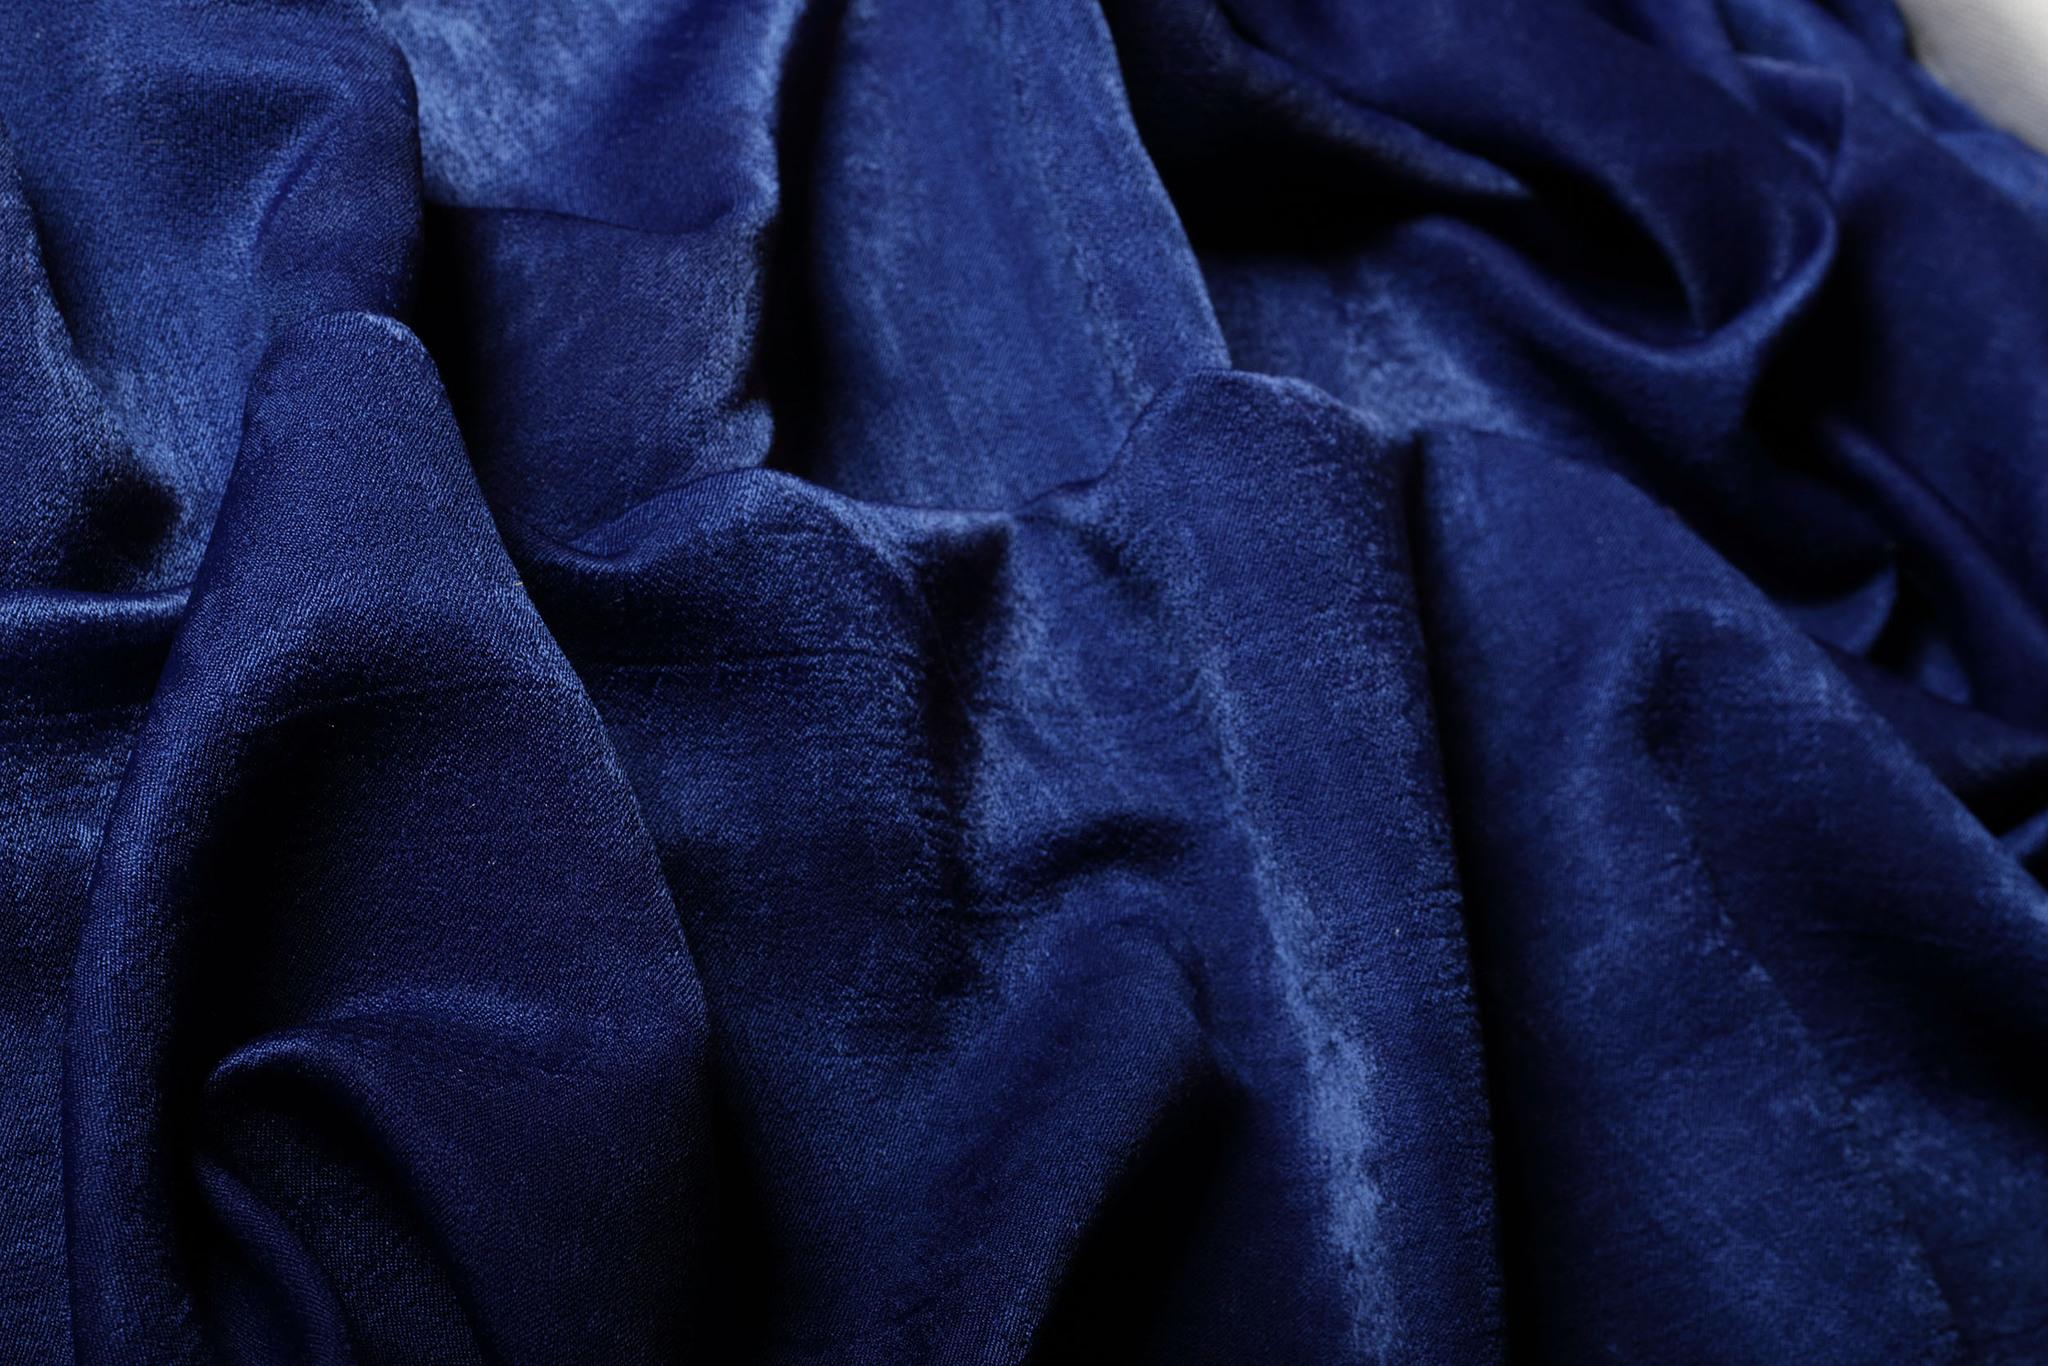 Suede (темно-синий). Готовая штора - имитация замши